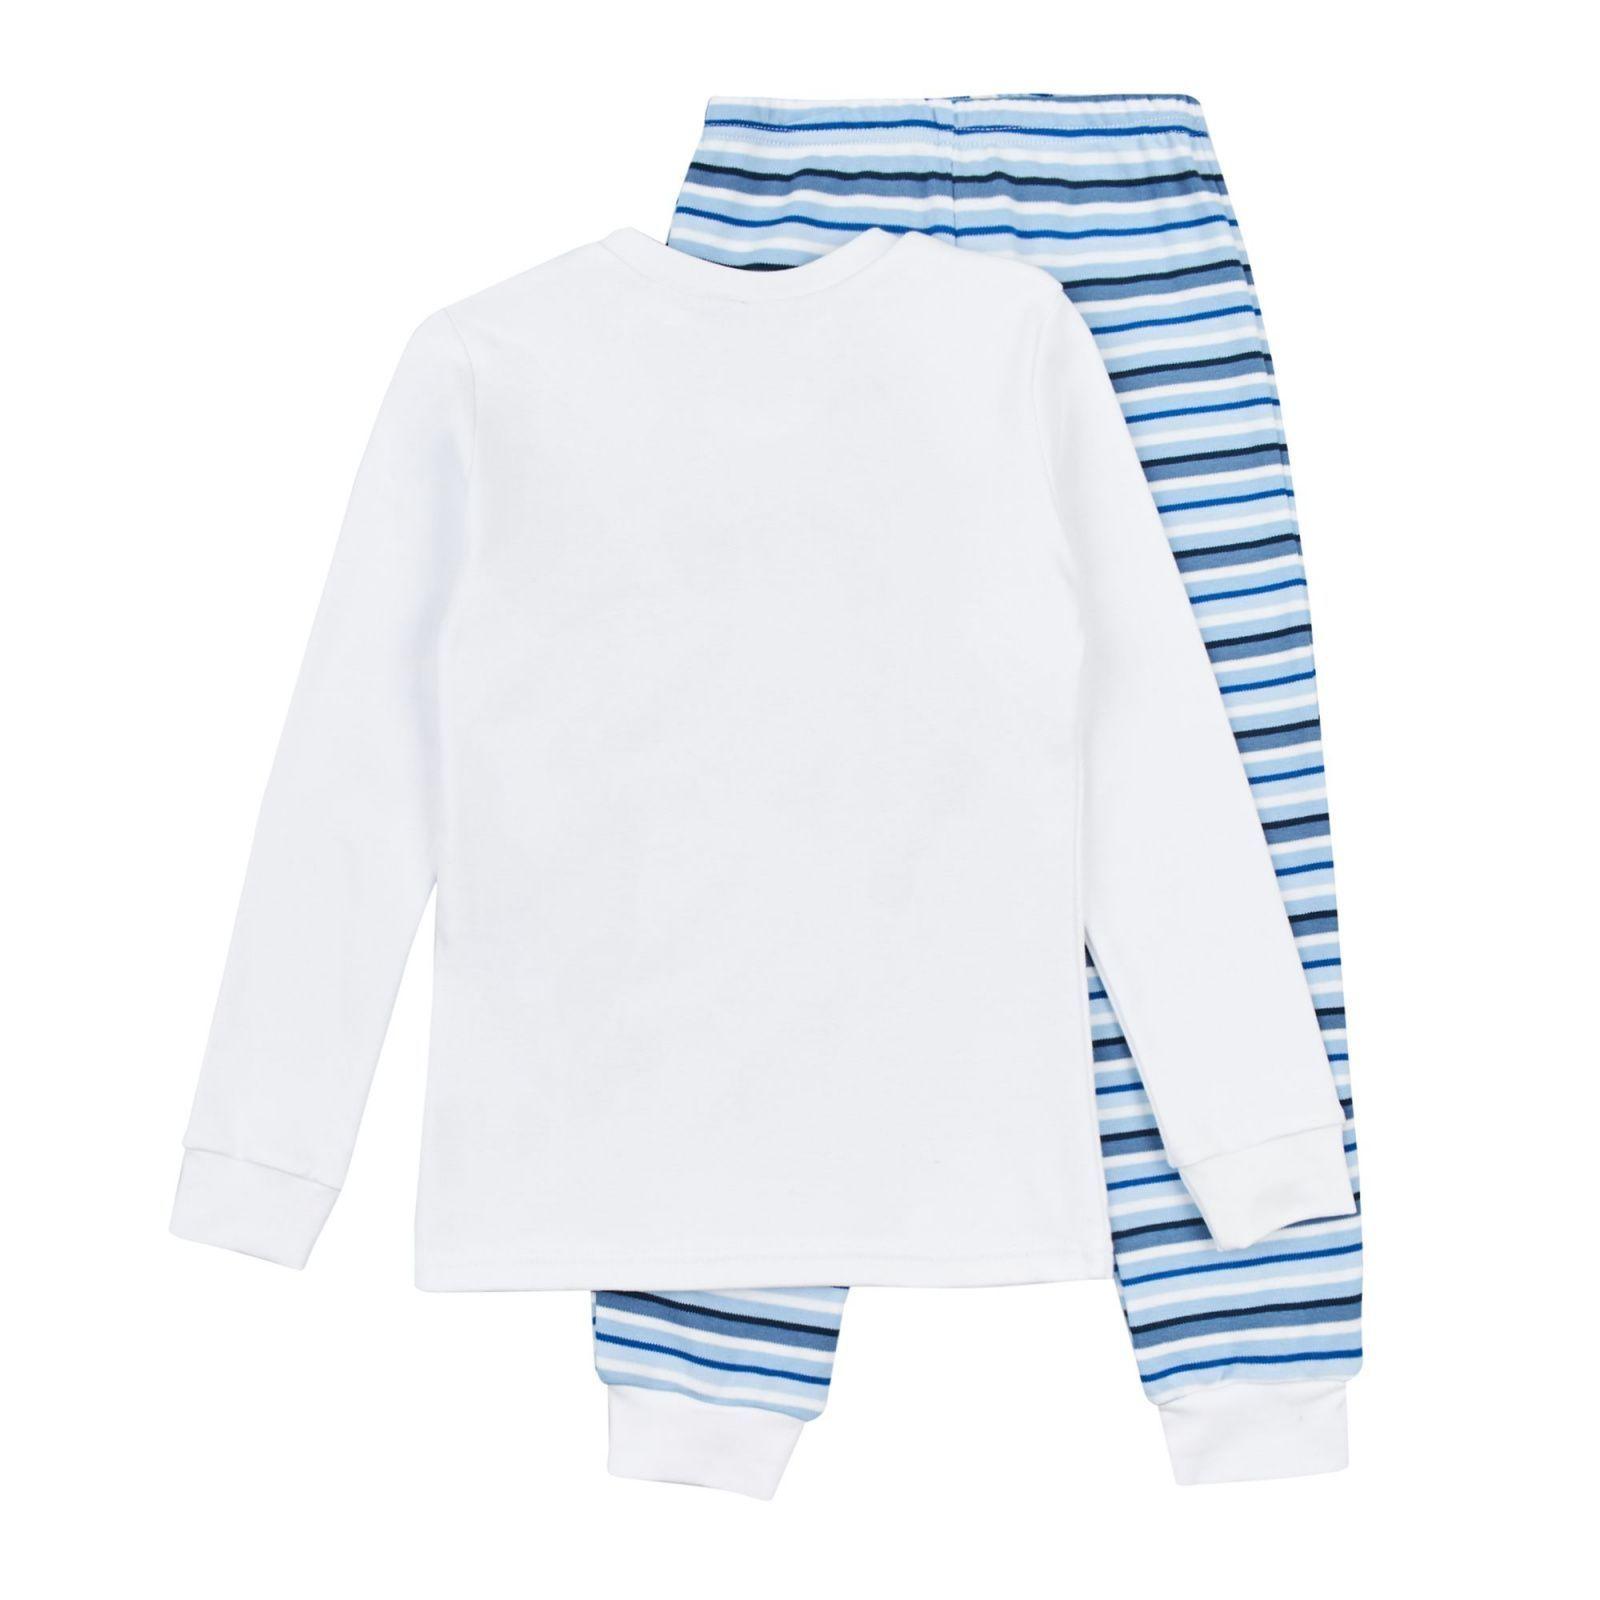 Пижама детские Garnamama модель 2EI~50841-15 цена, 2017